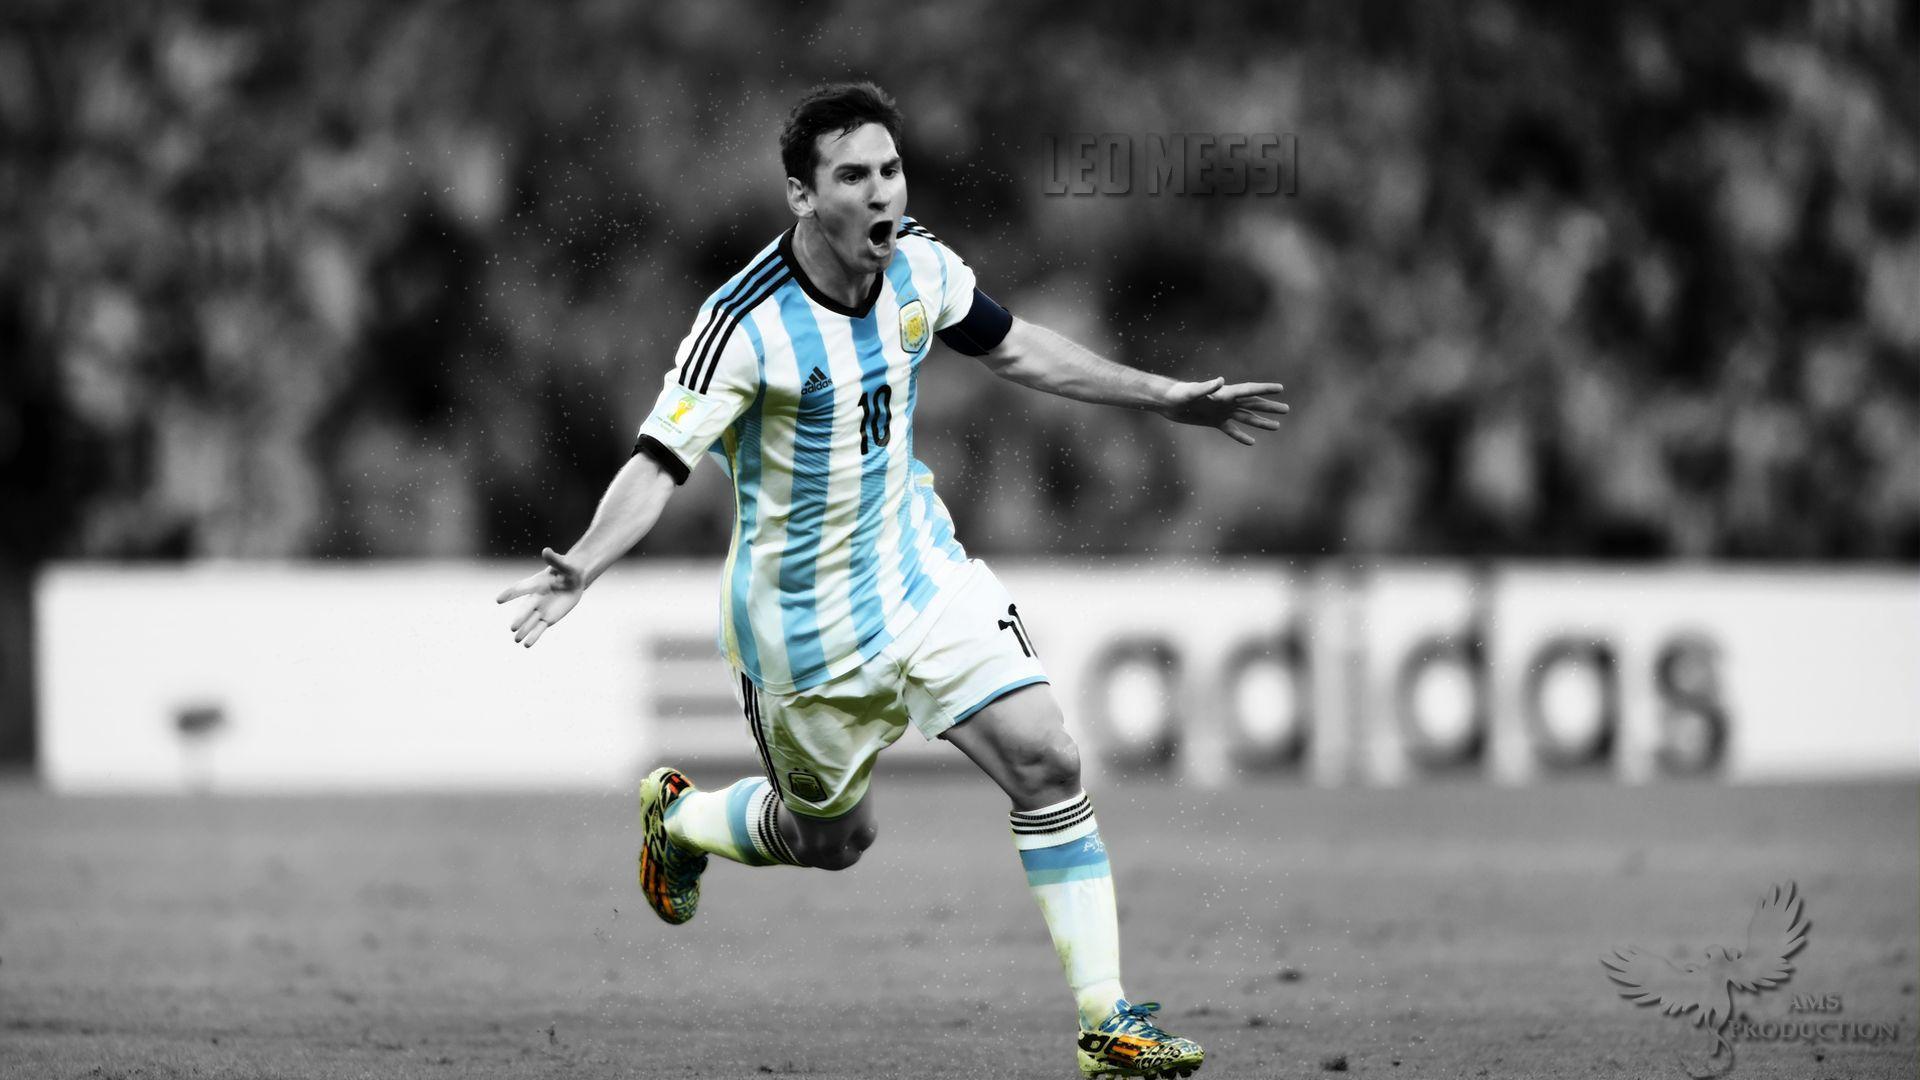 Messi Argentina Wallpapers - Wallpaper Cave